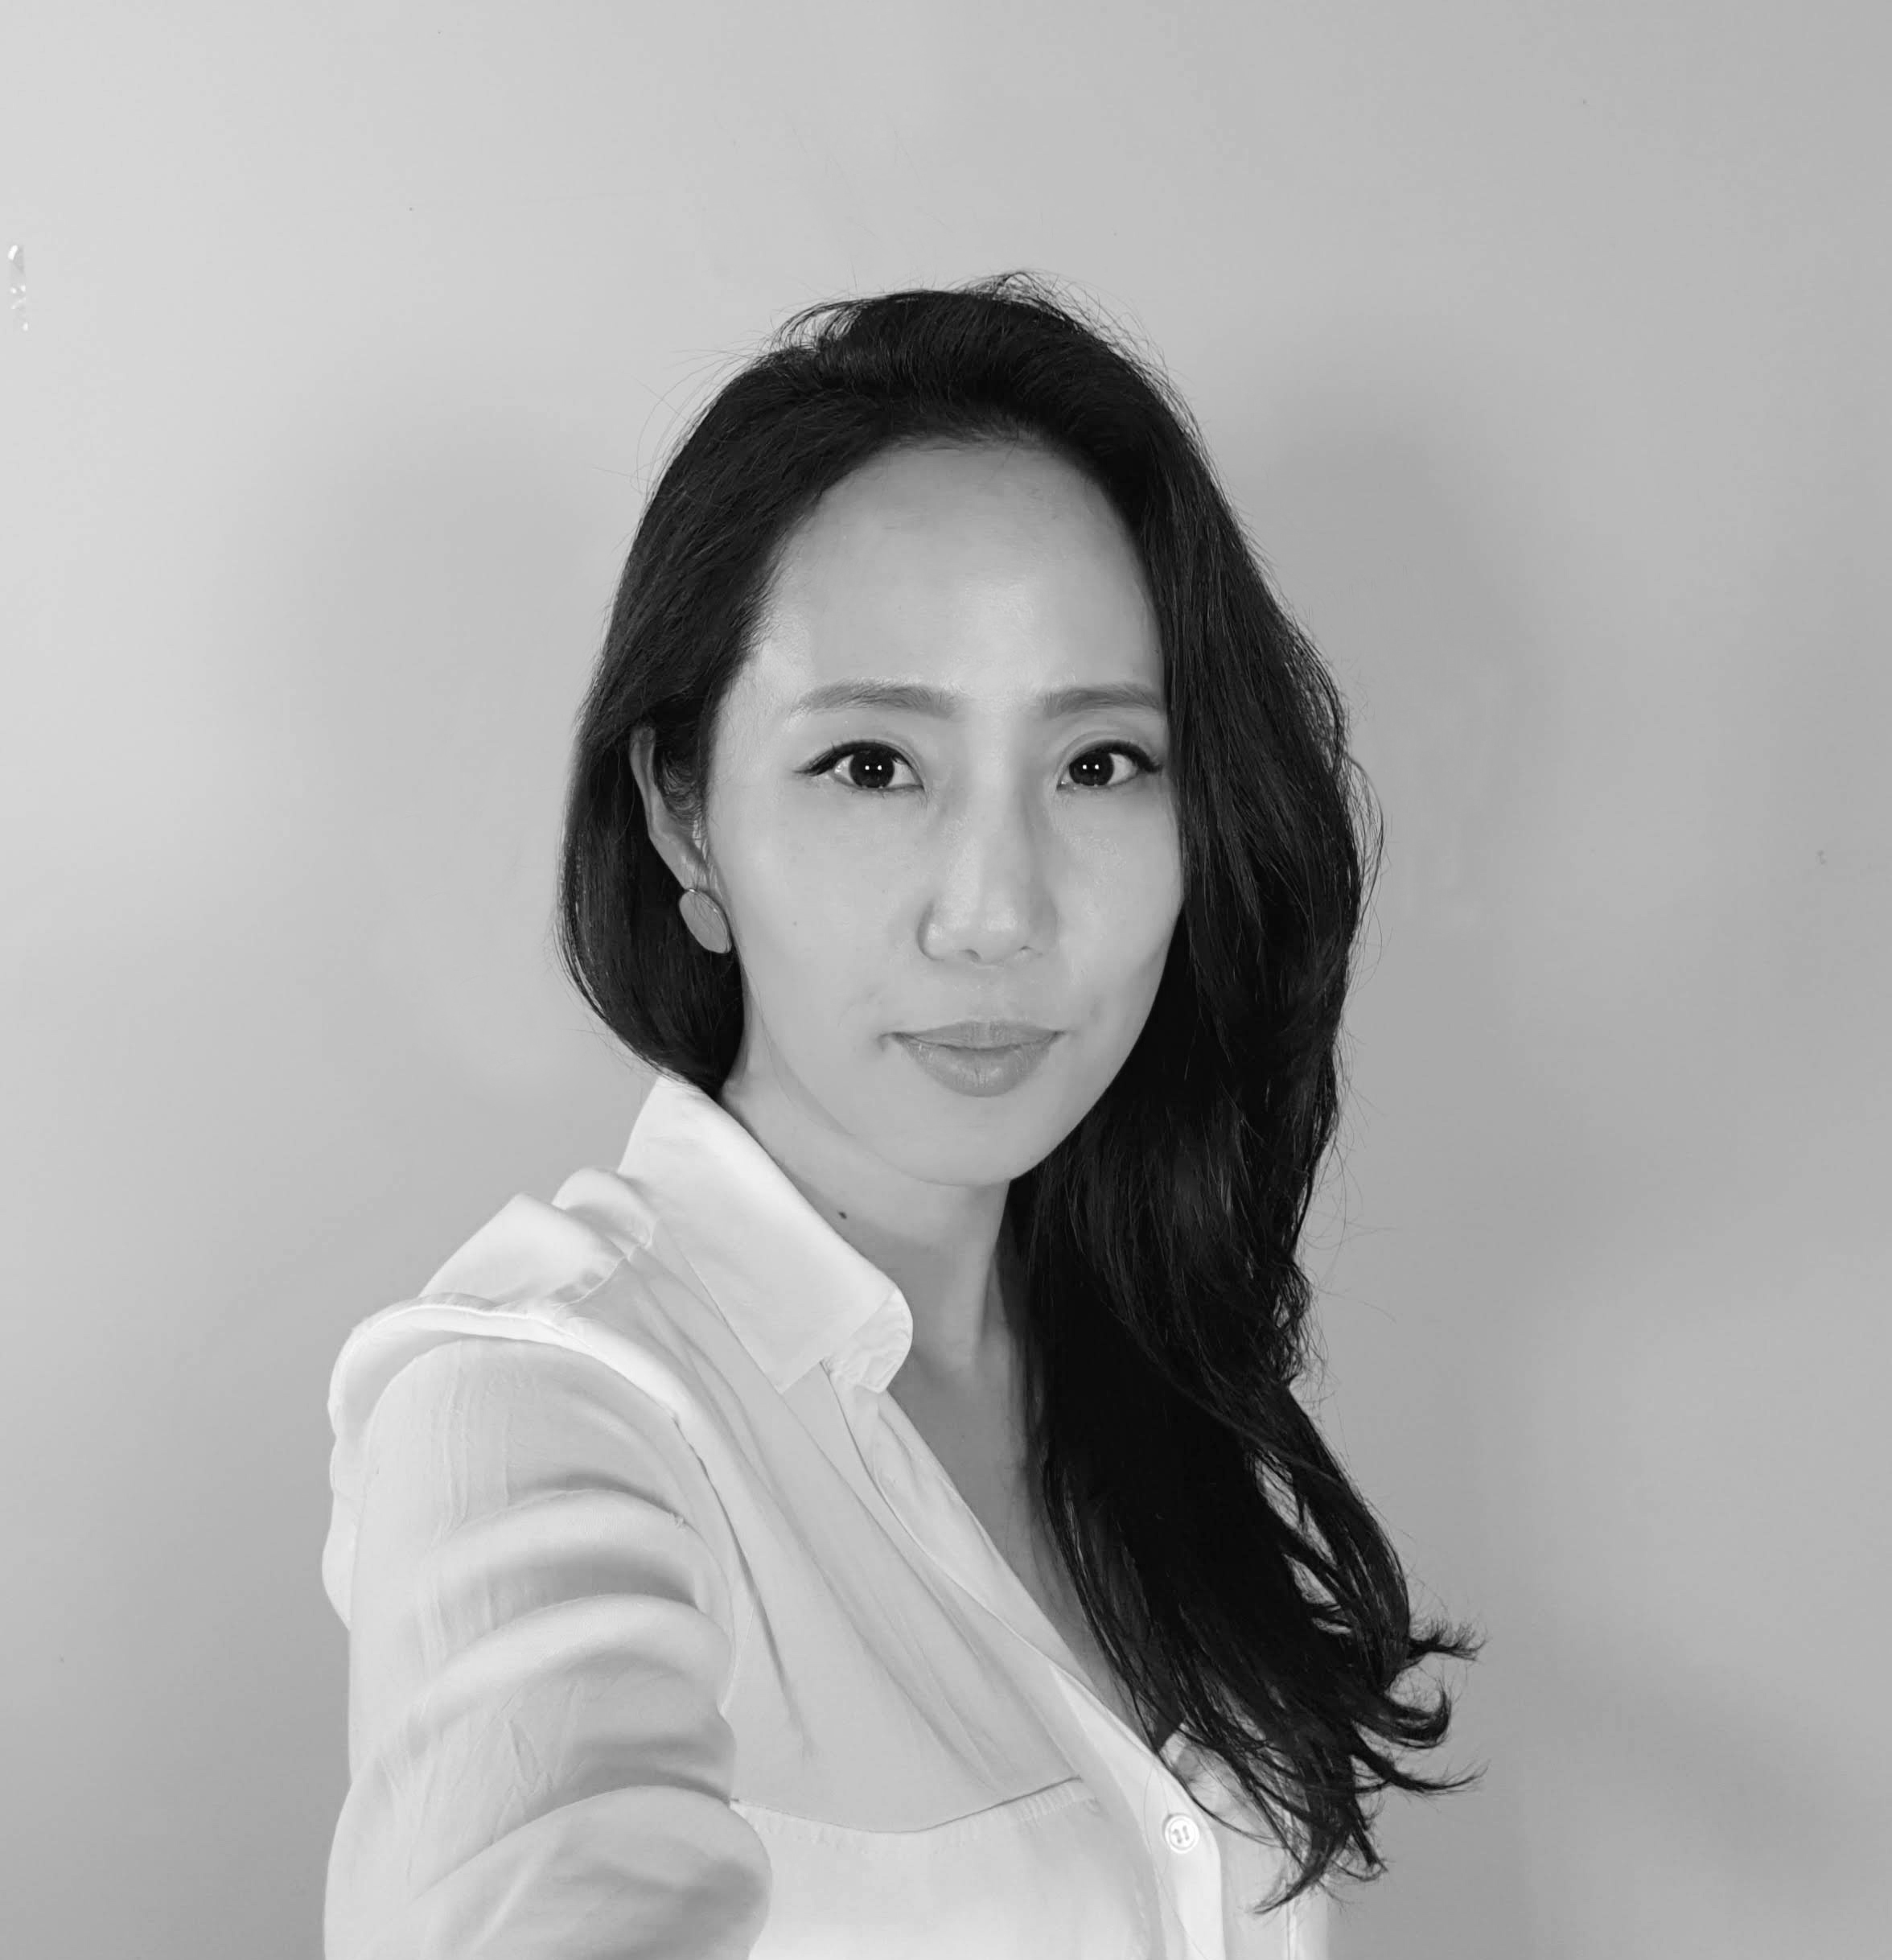 Soohyun Chang_profile_180814_Bw.jpg